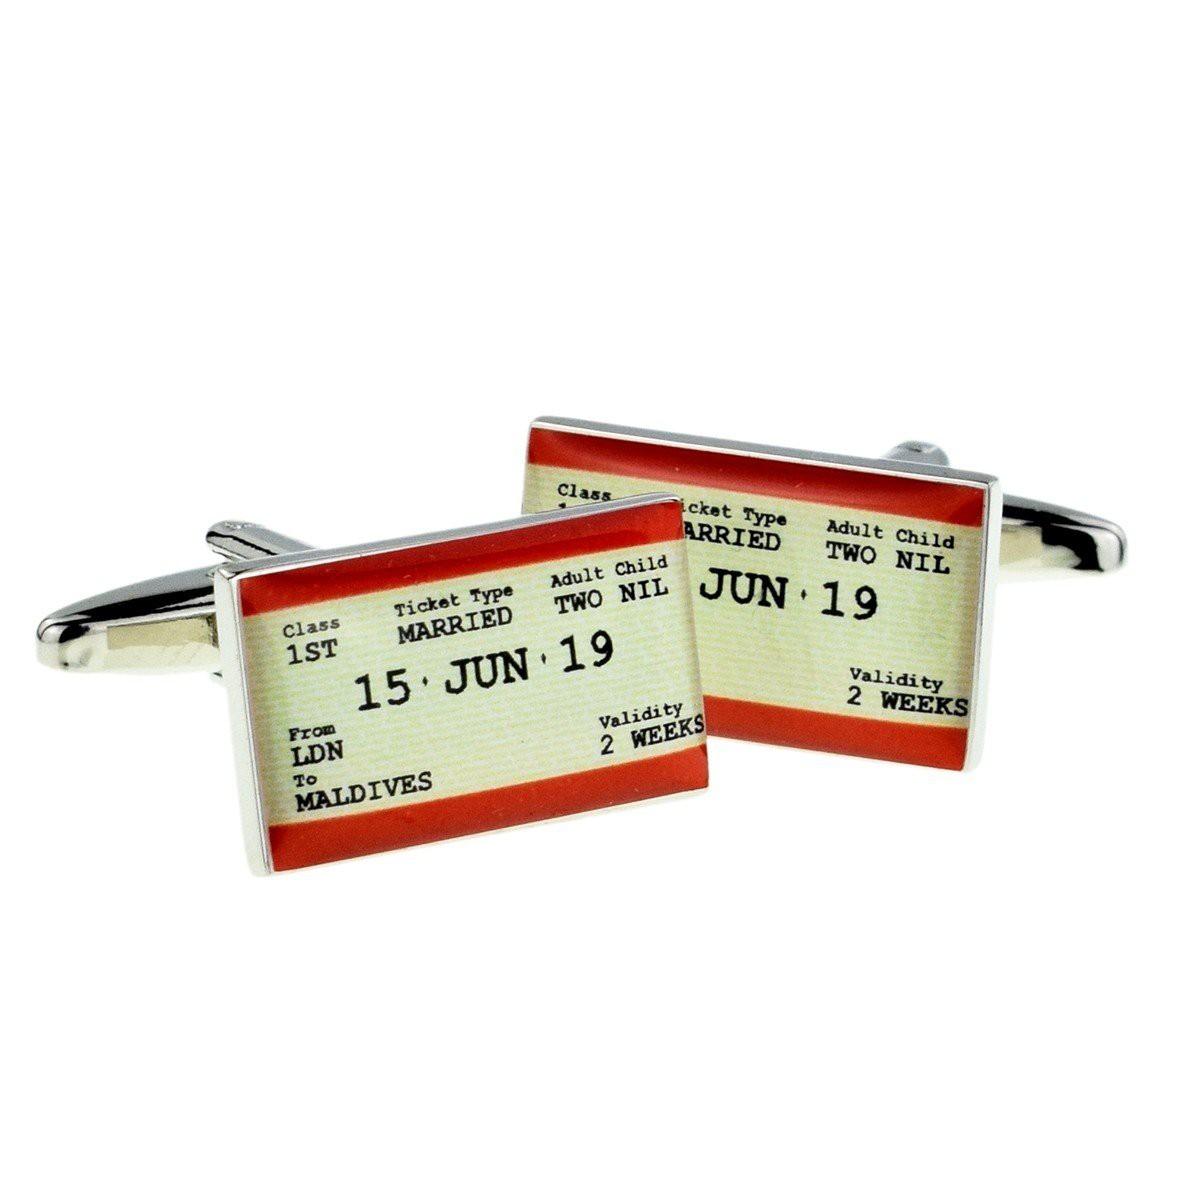 PERSONALISED TRAVEL TICKET STYLE WEDDING CUFFLINKS £19.99